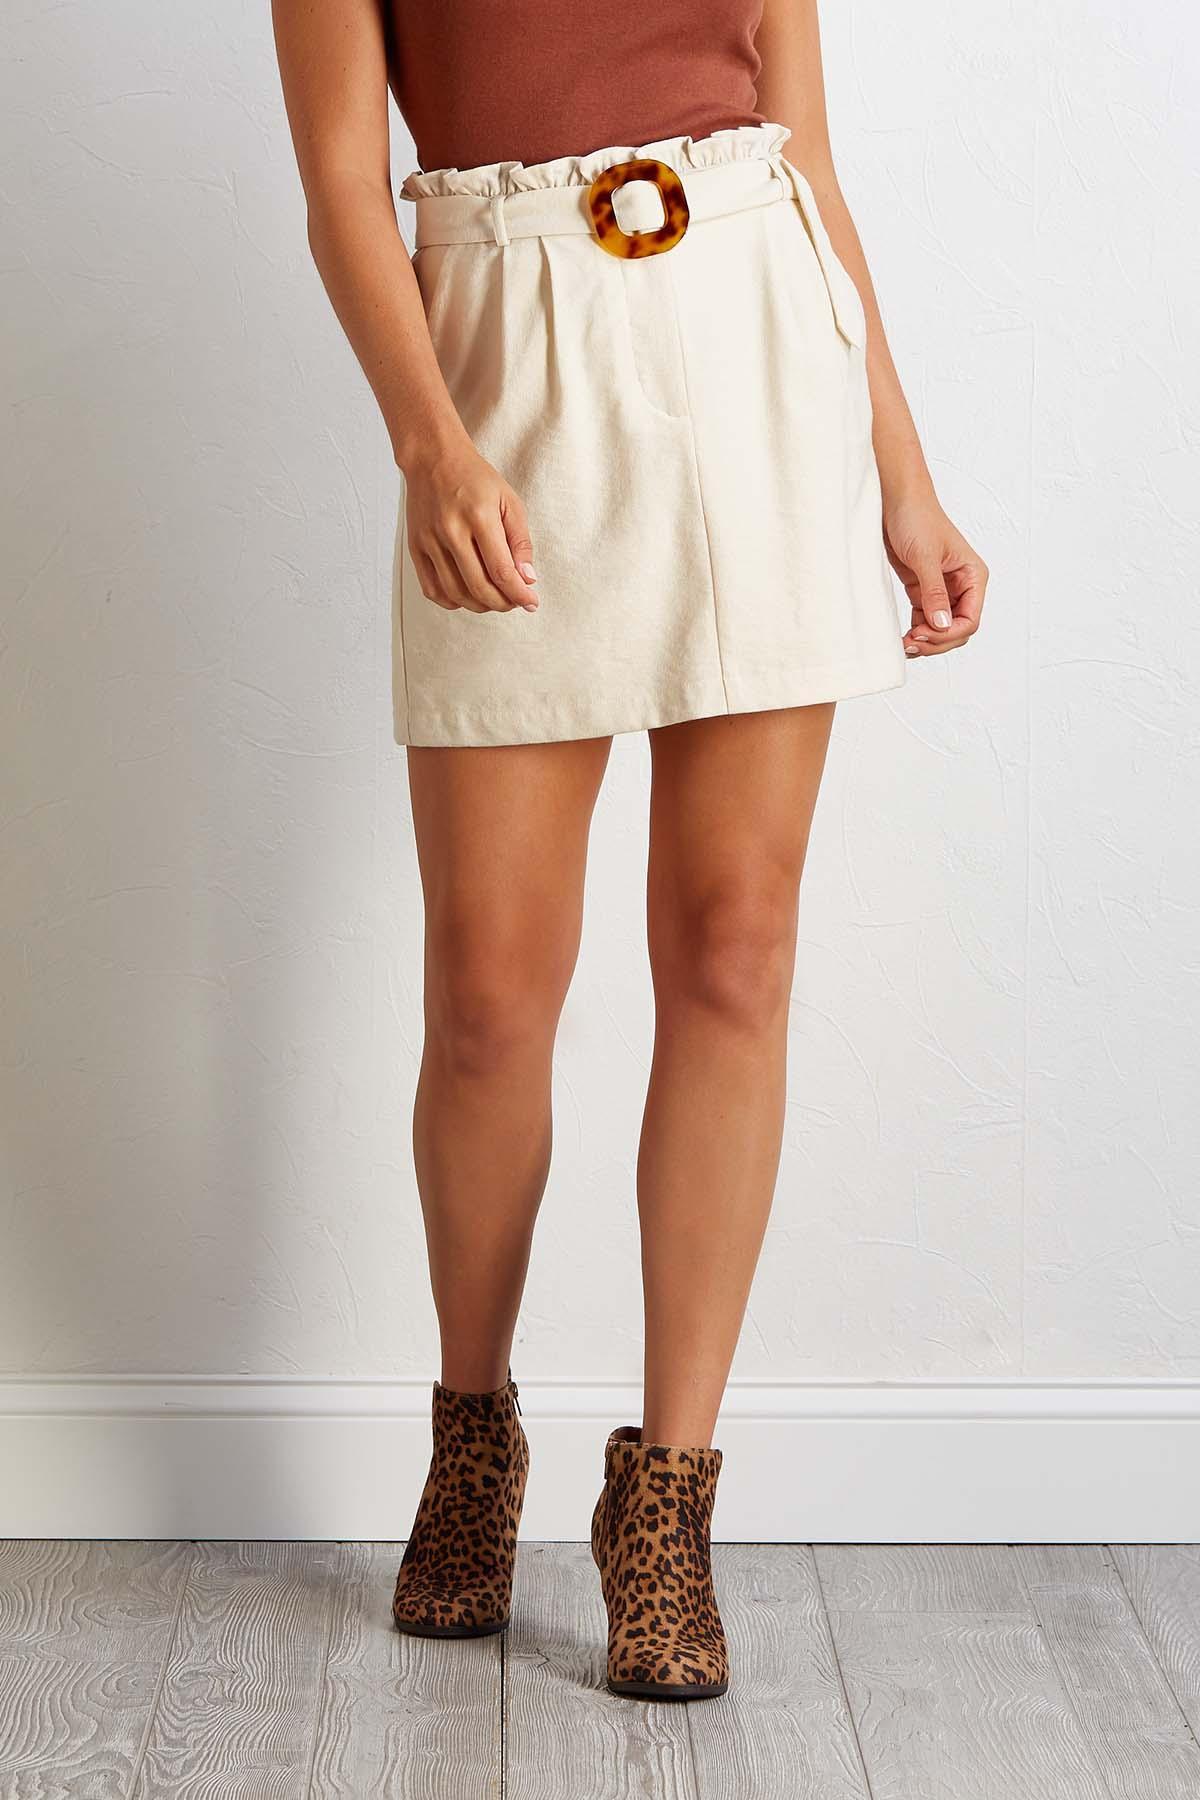 Put O- Ring On It Skirt